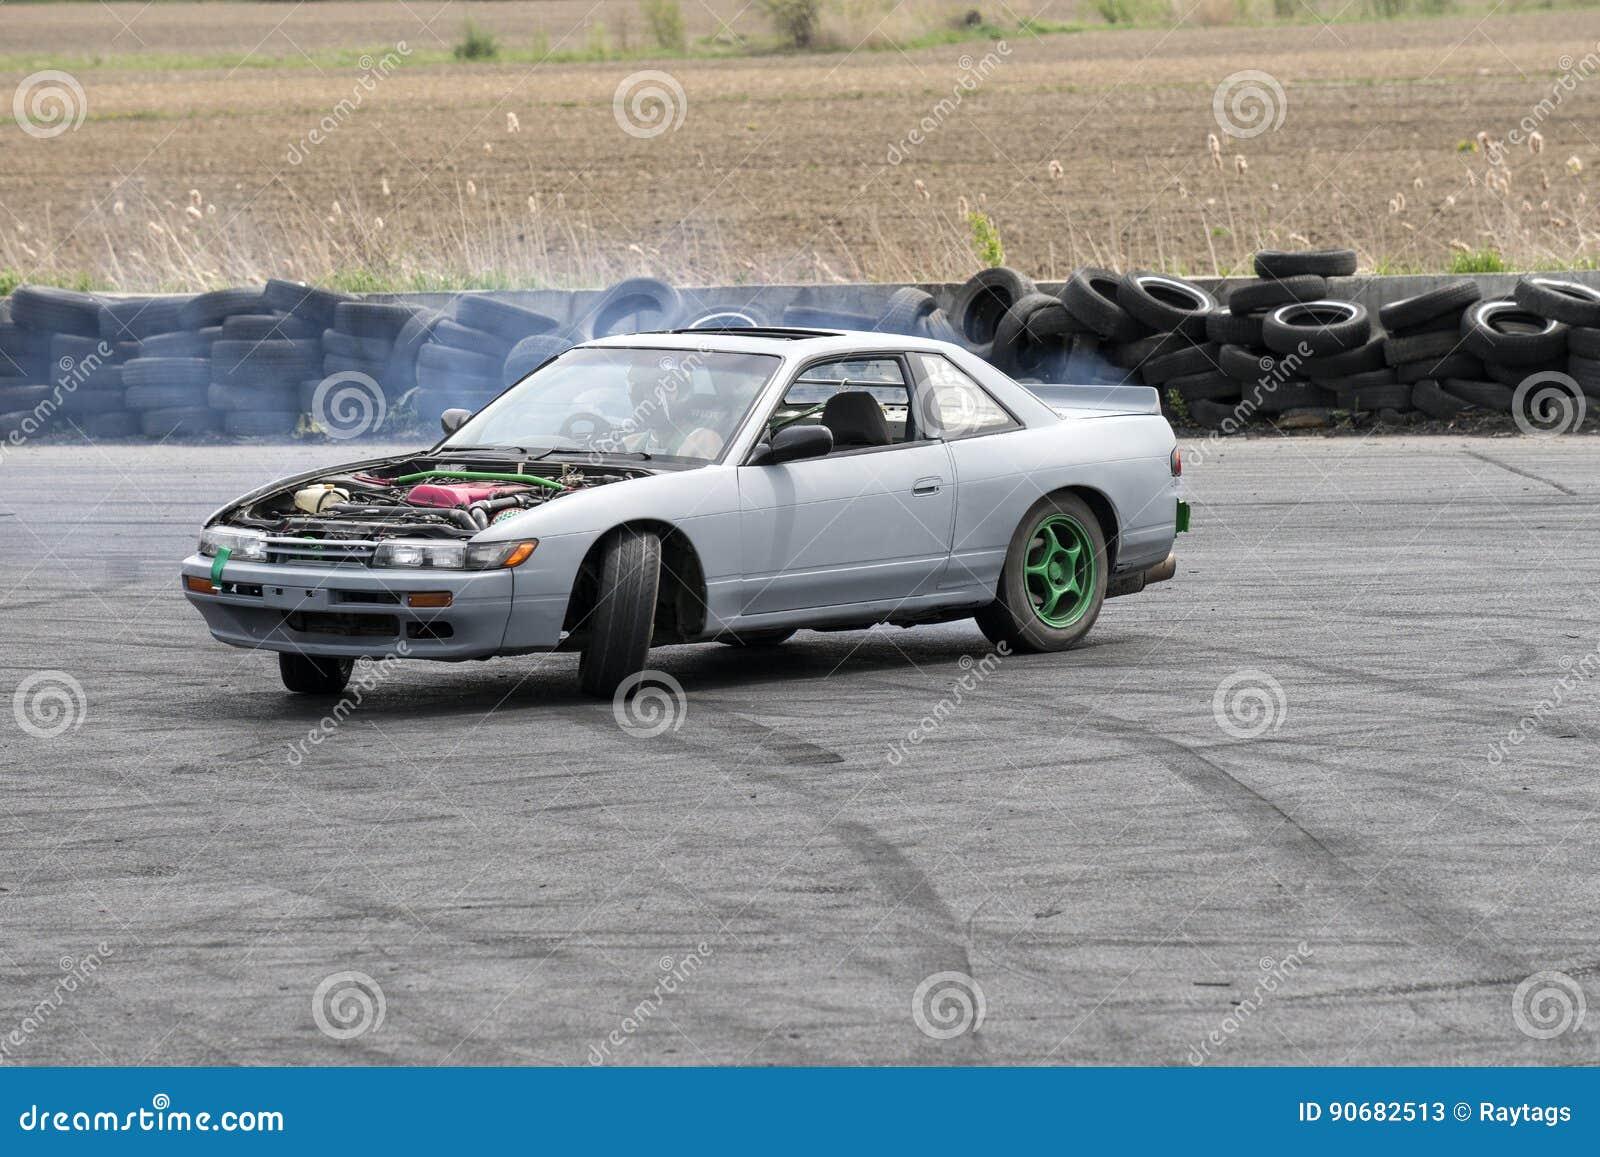 Car drifting editorial stock photo  Image of events, formula